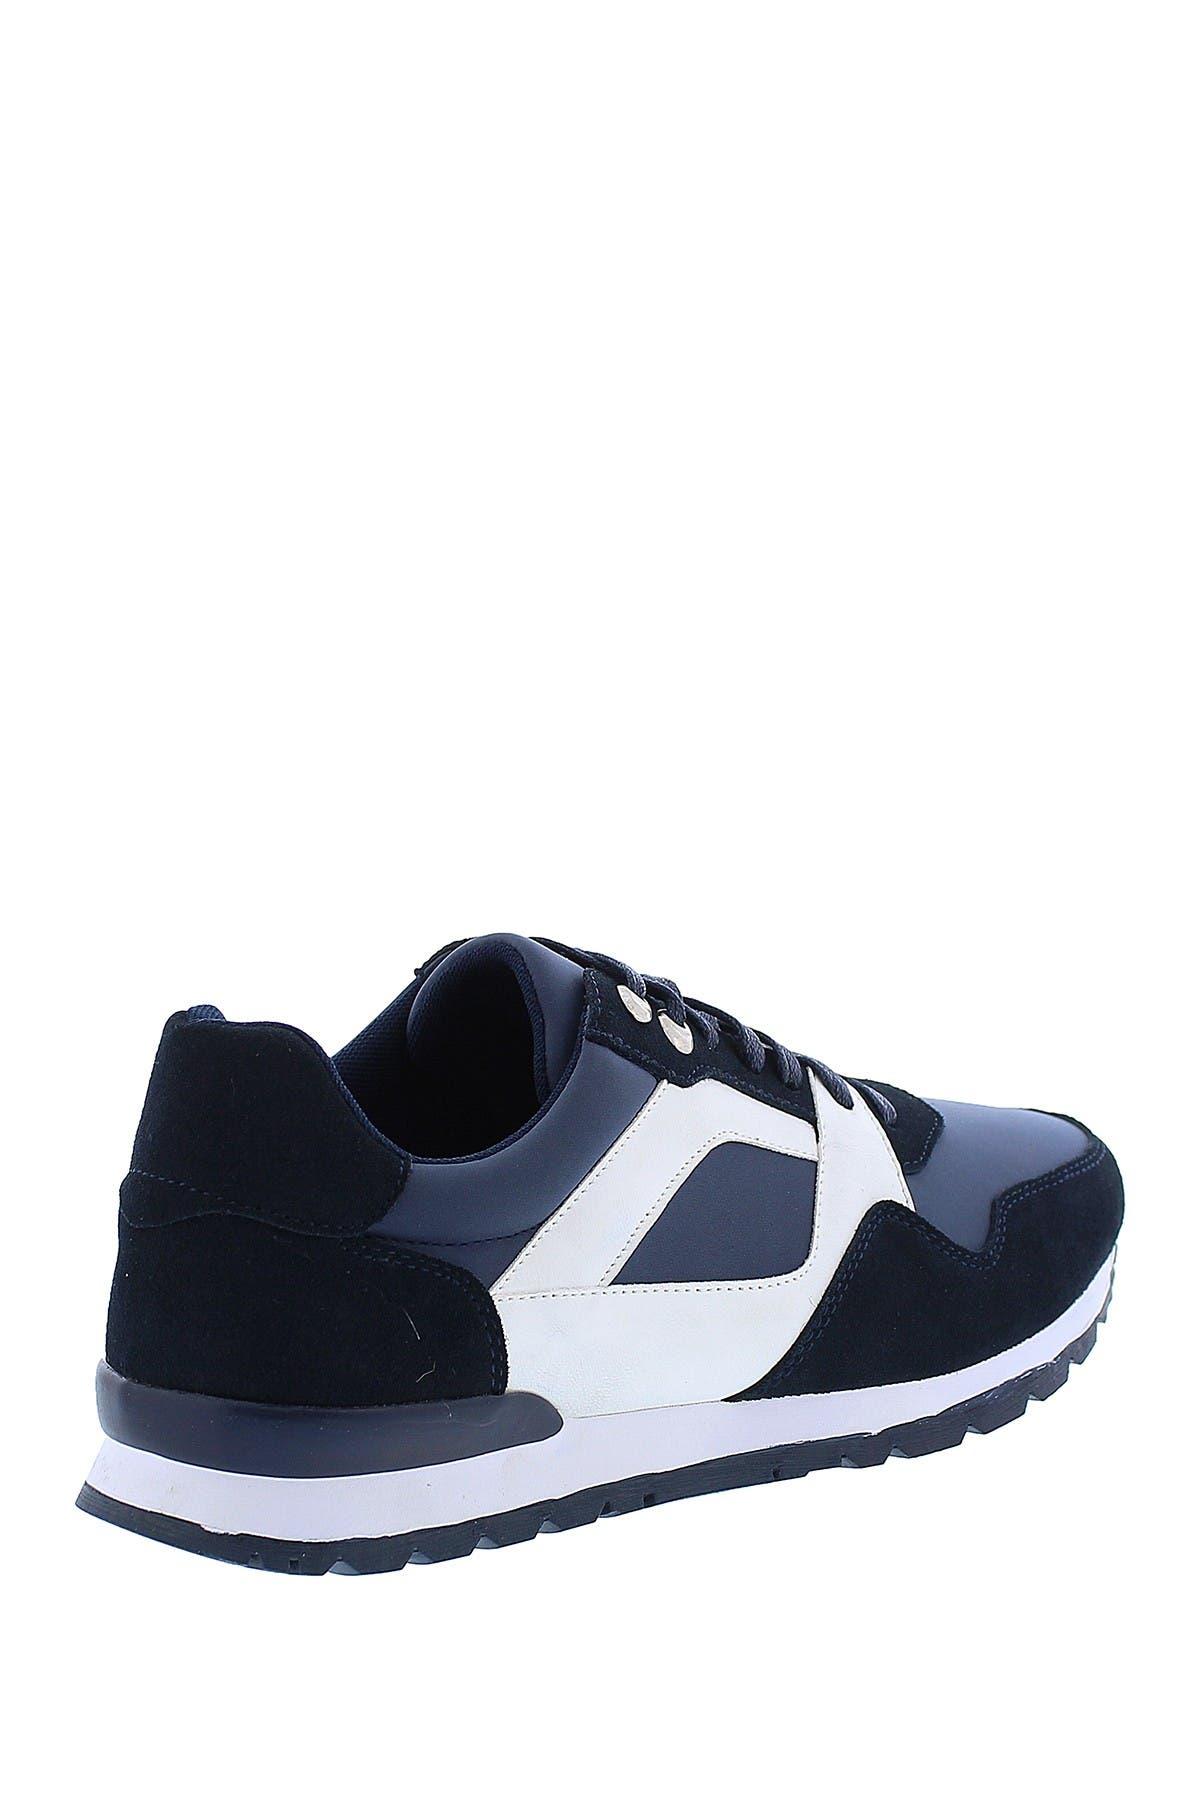 English Laundry Delvin Sneaker In Navy